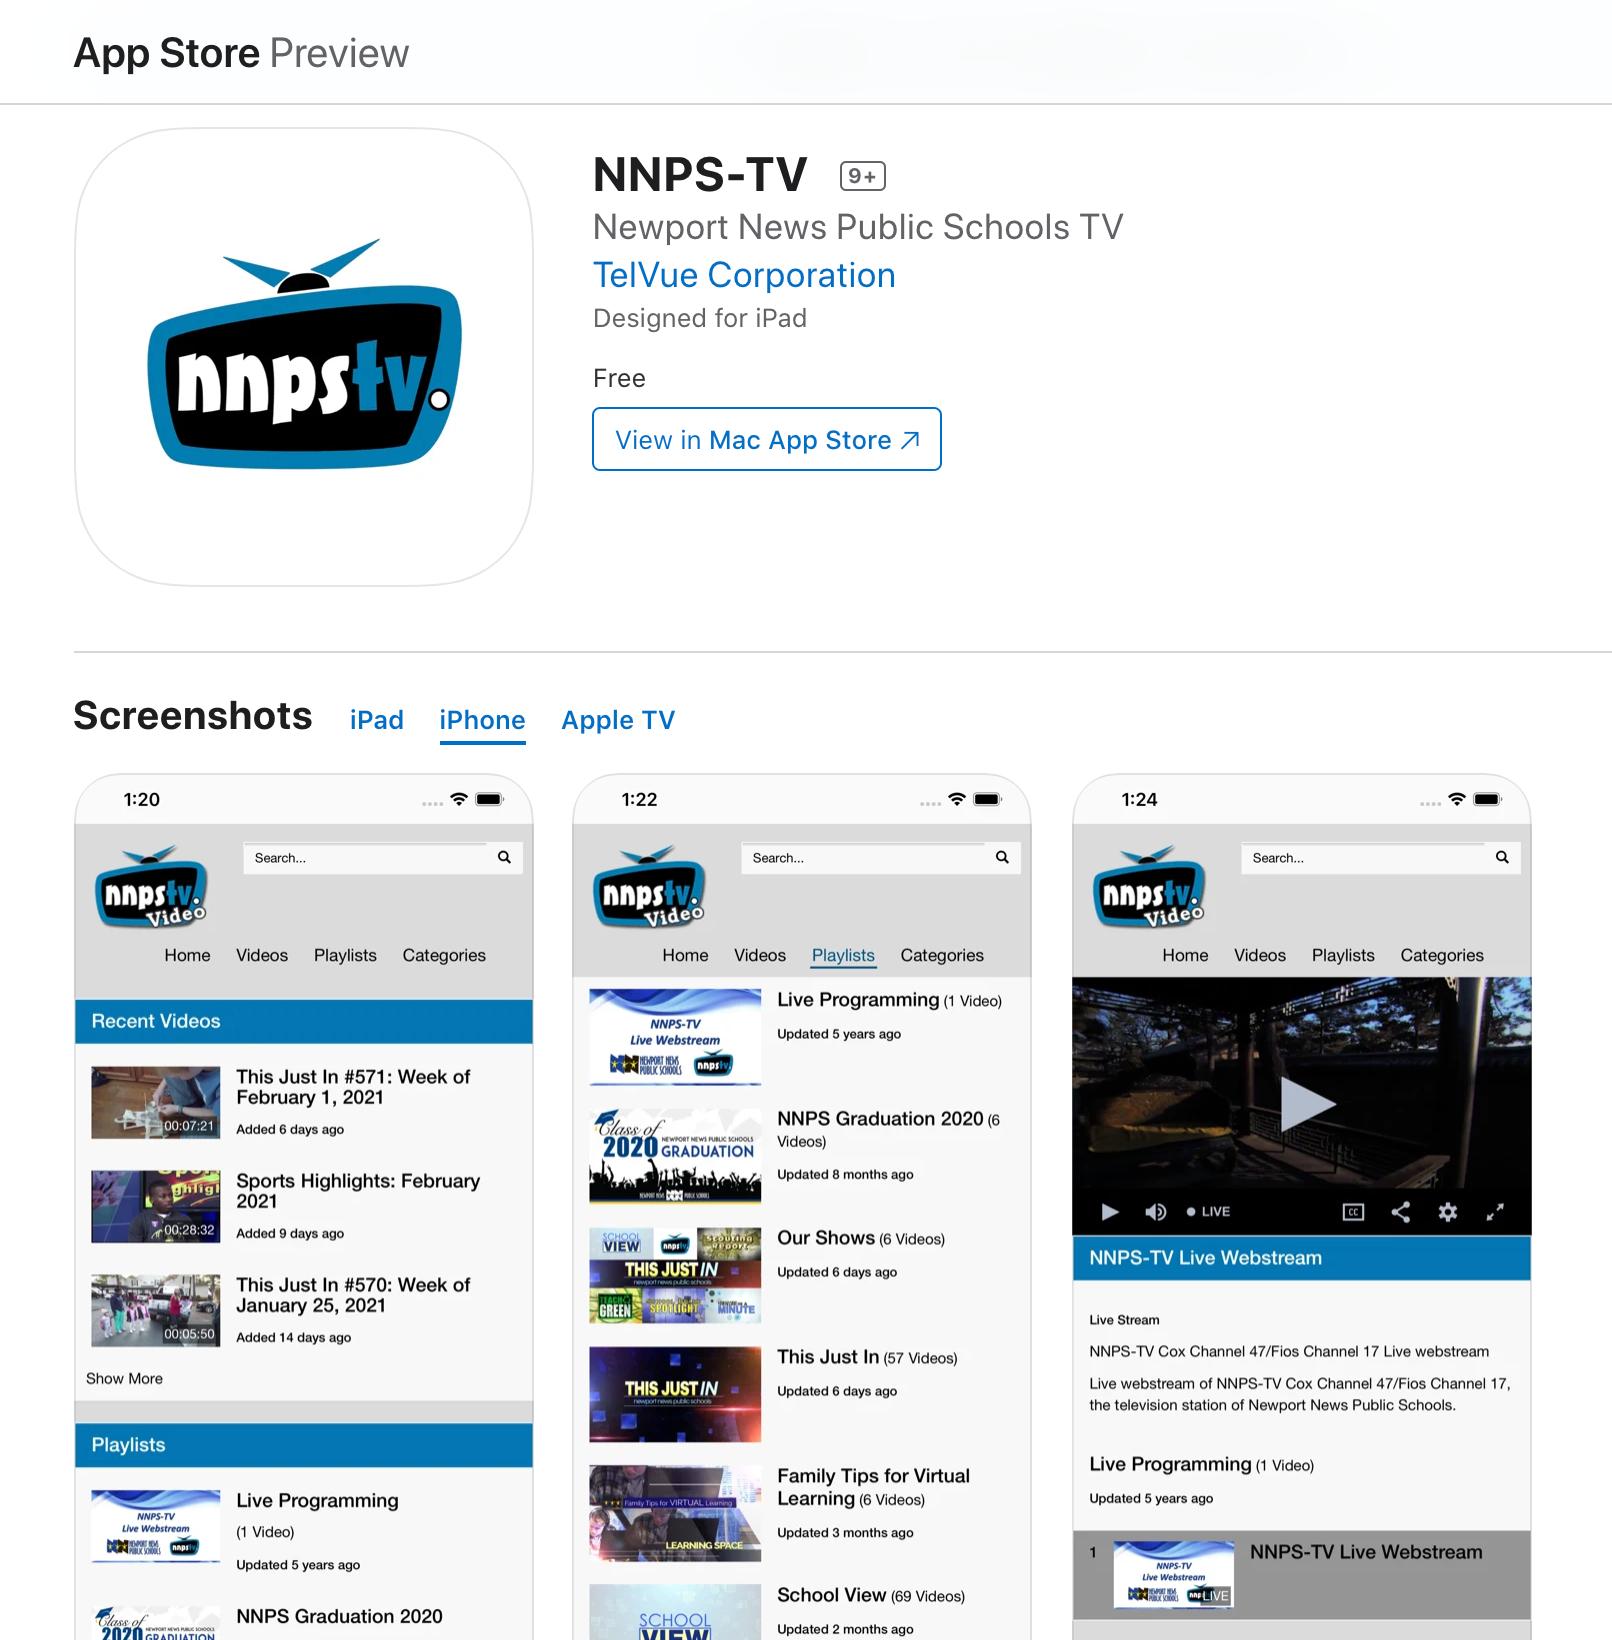 NNPS-TV App Store